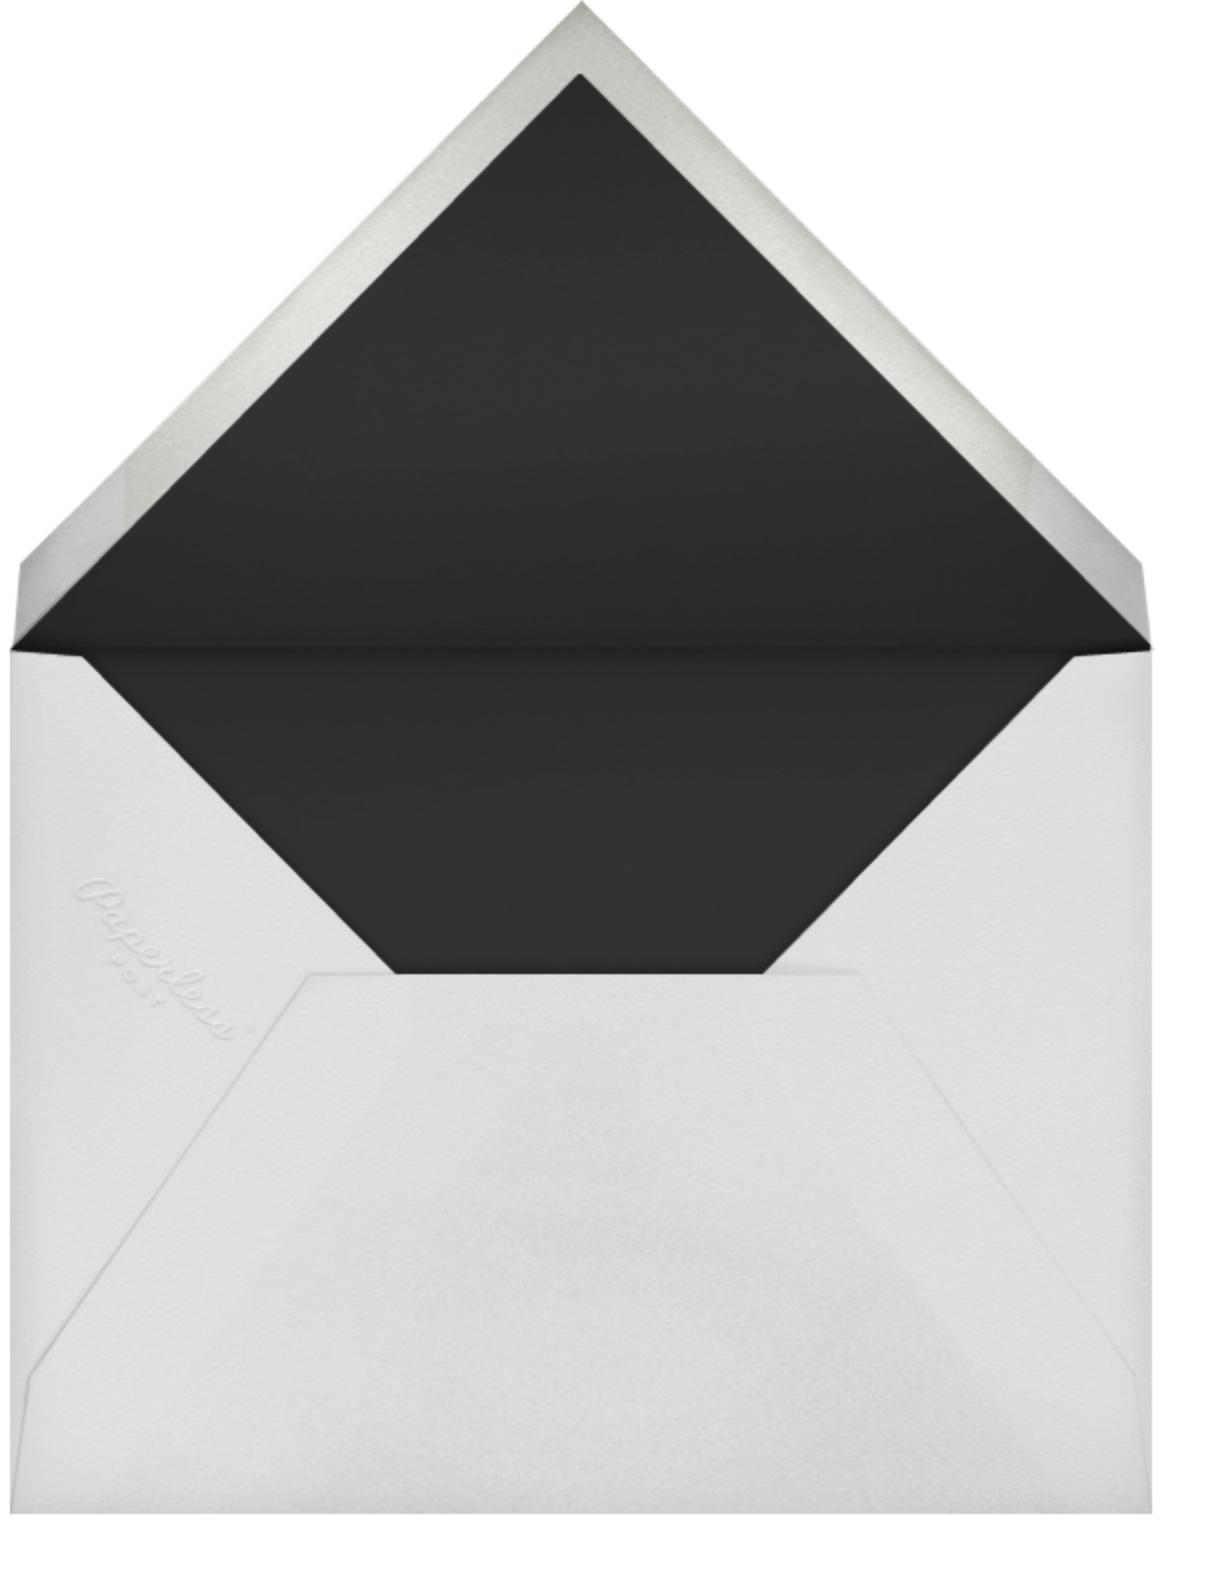 Richmond Park (Save the Date) - White/Gold - Oscar de la Renta - Gold and metallic - envelope back